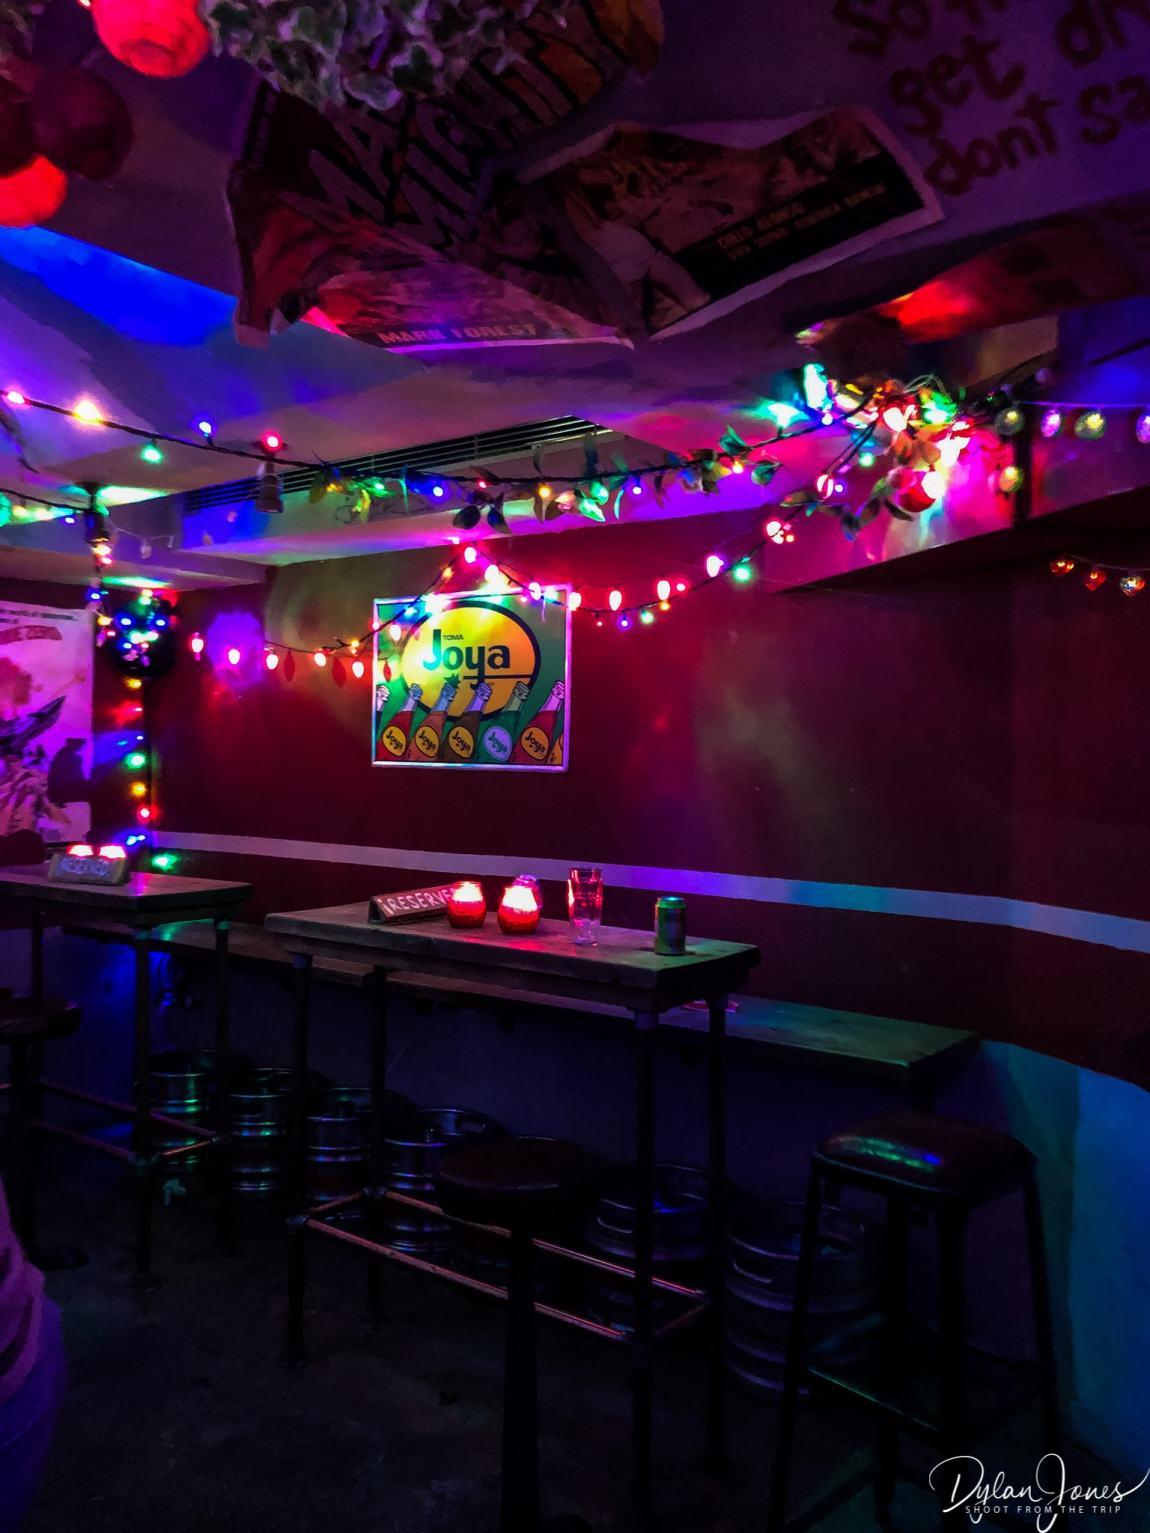 Call Me Mr. Lucky - a secret dive bar in the London Bridge area